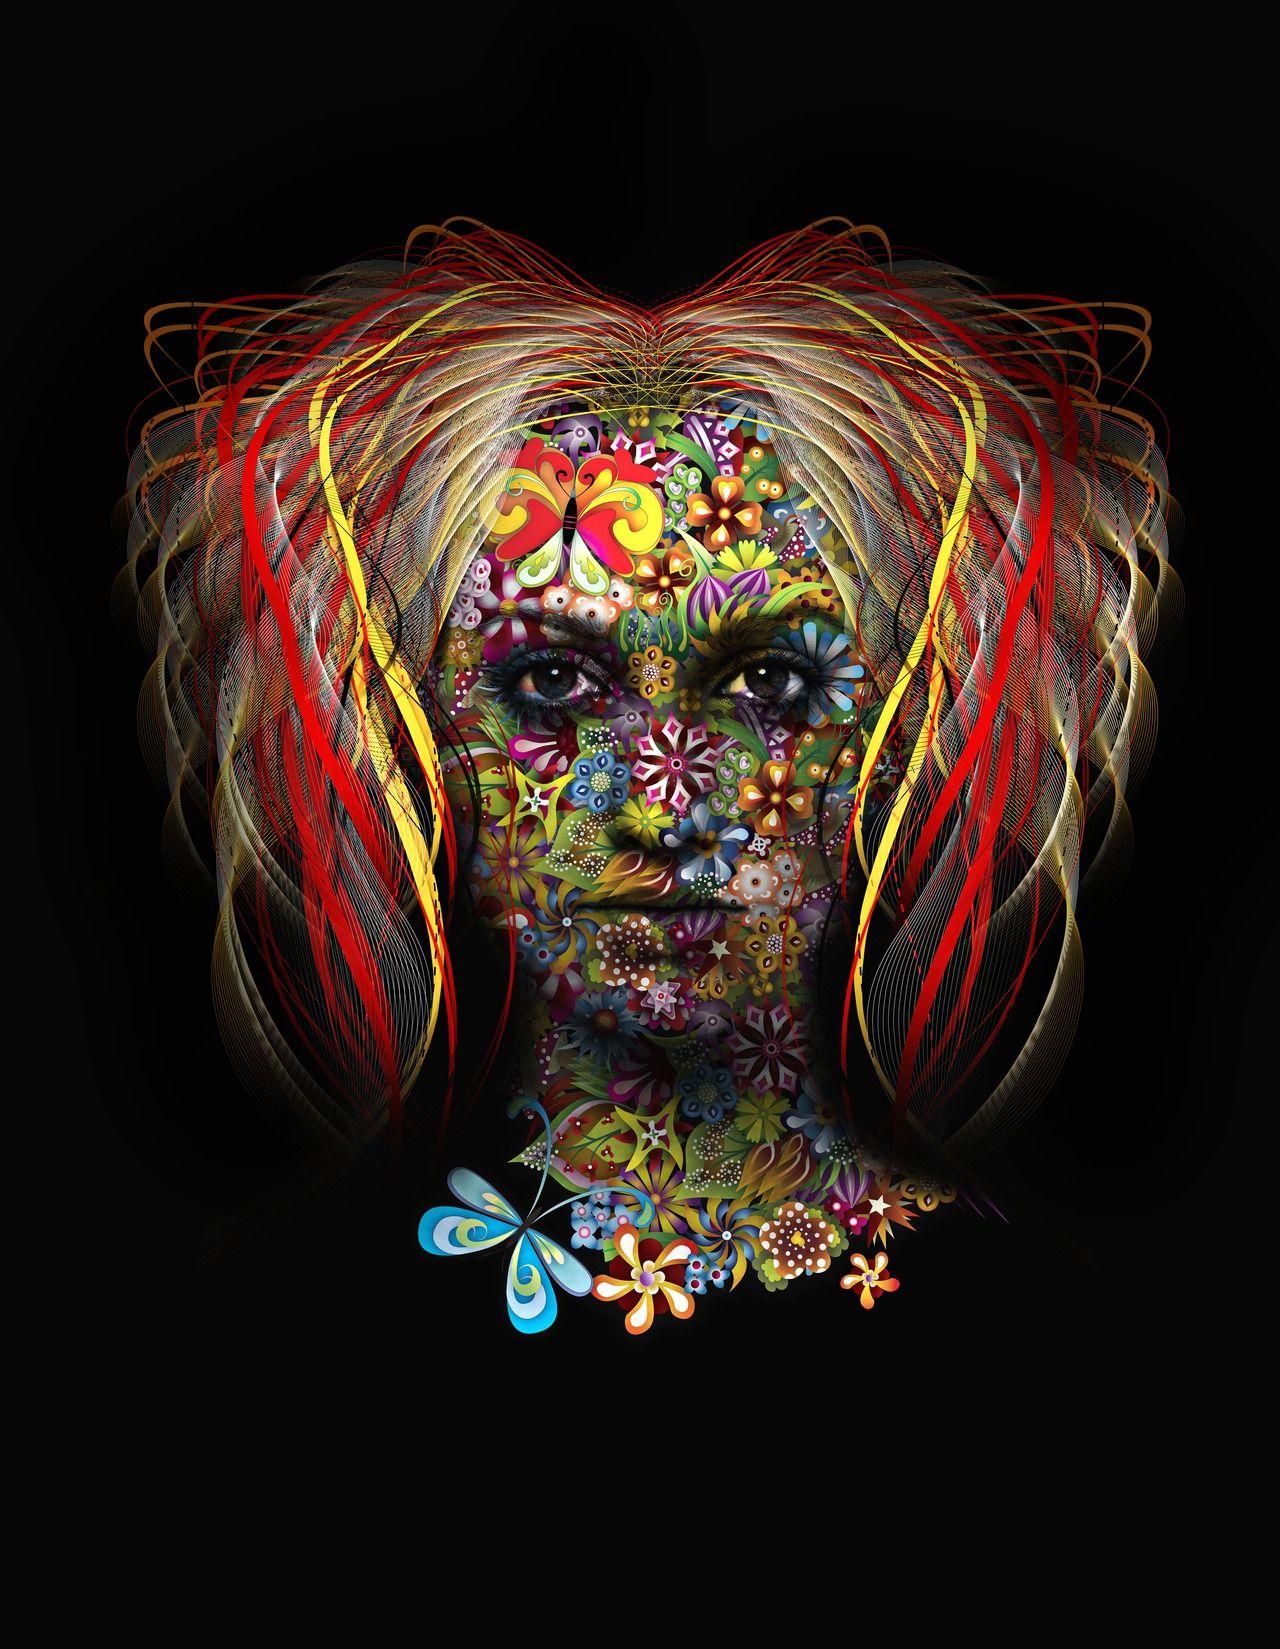 Flower face creative artwork famous artwork face